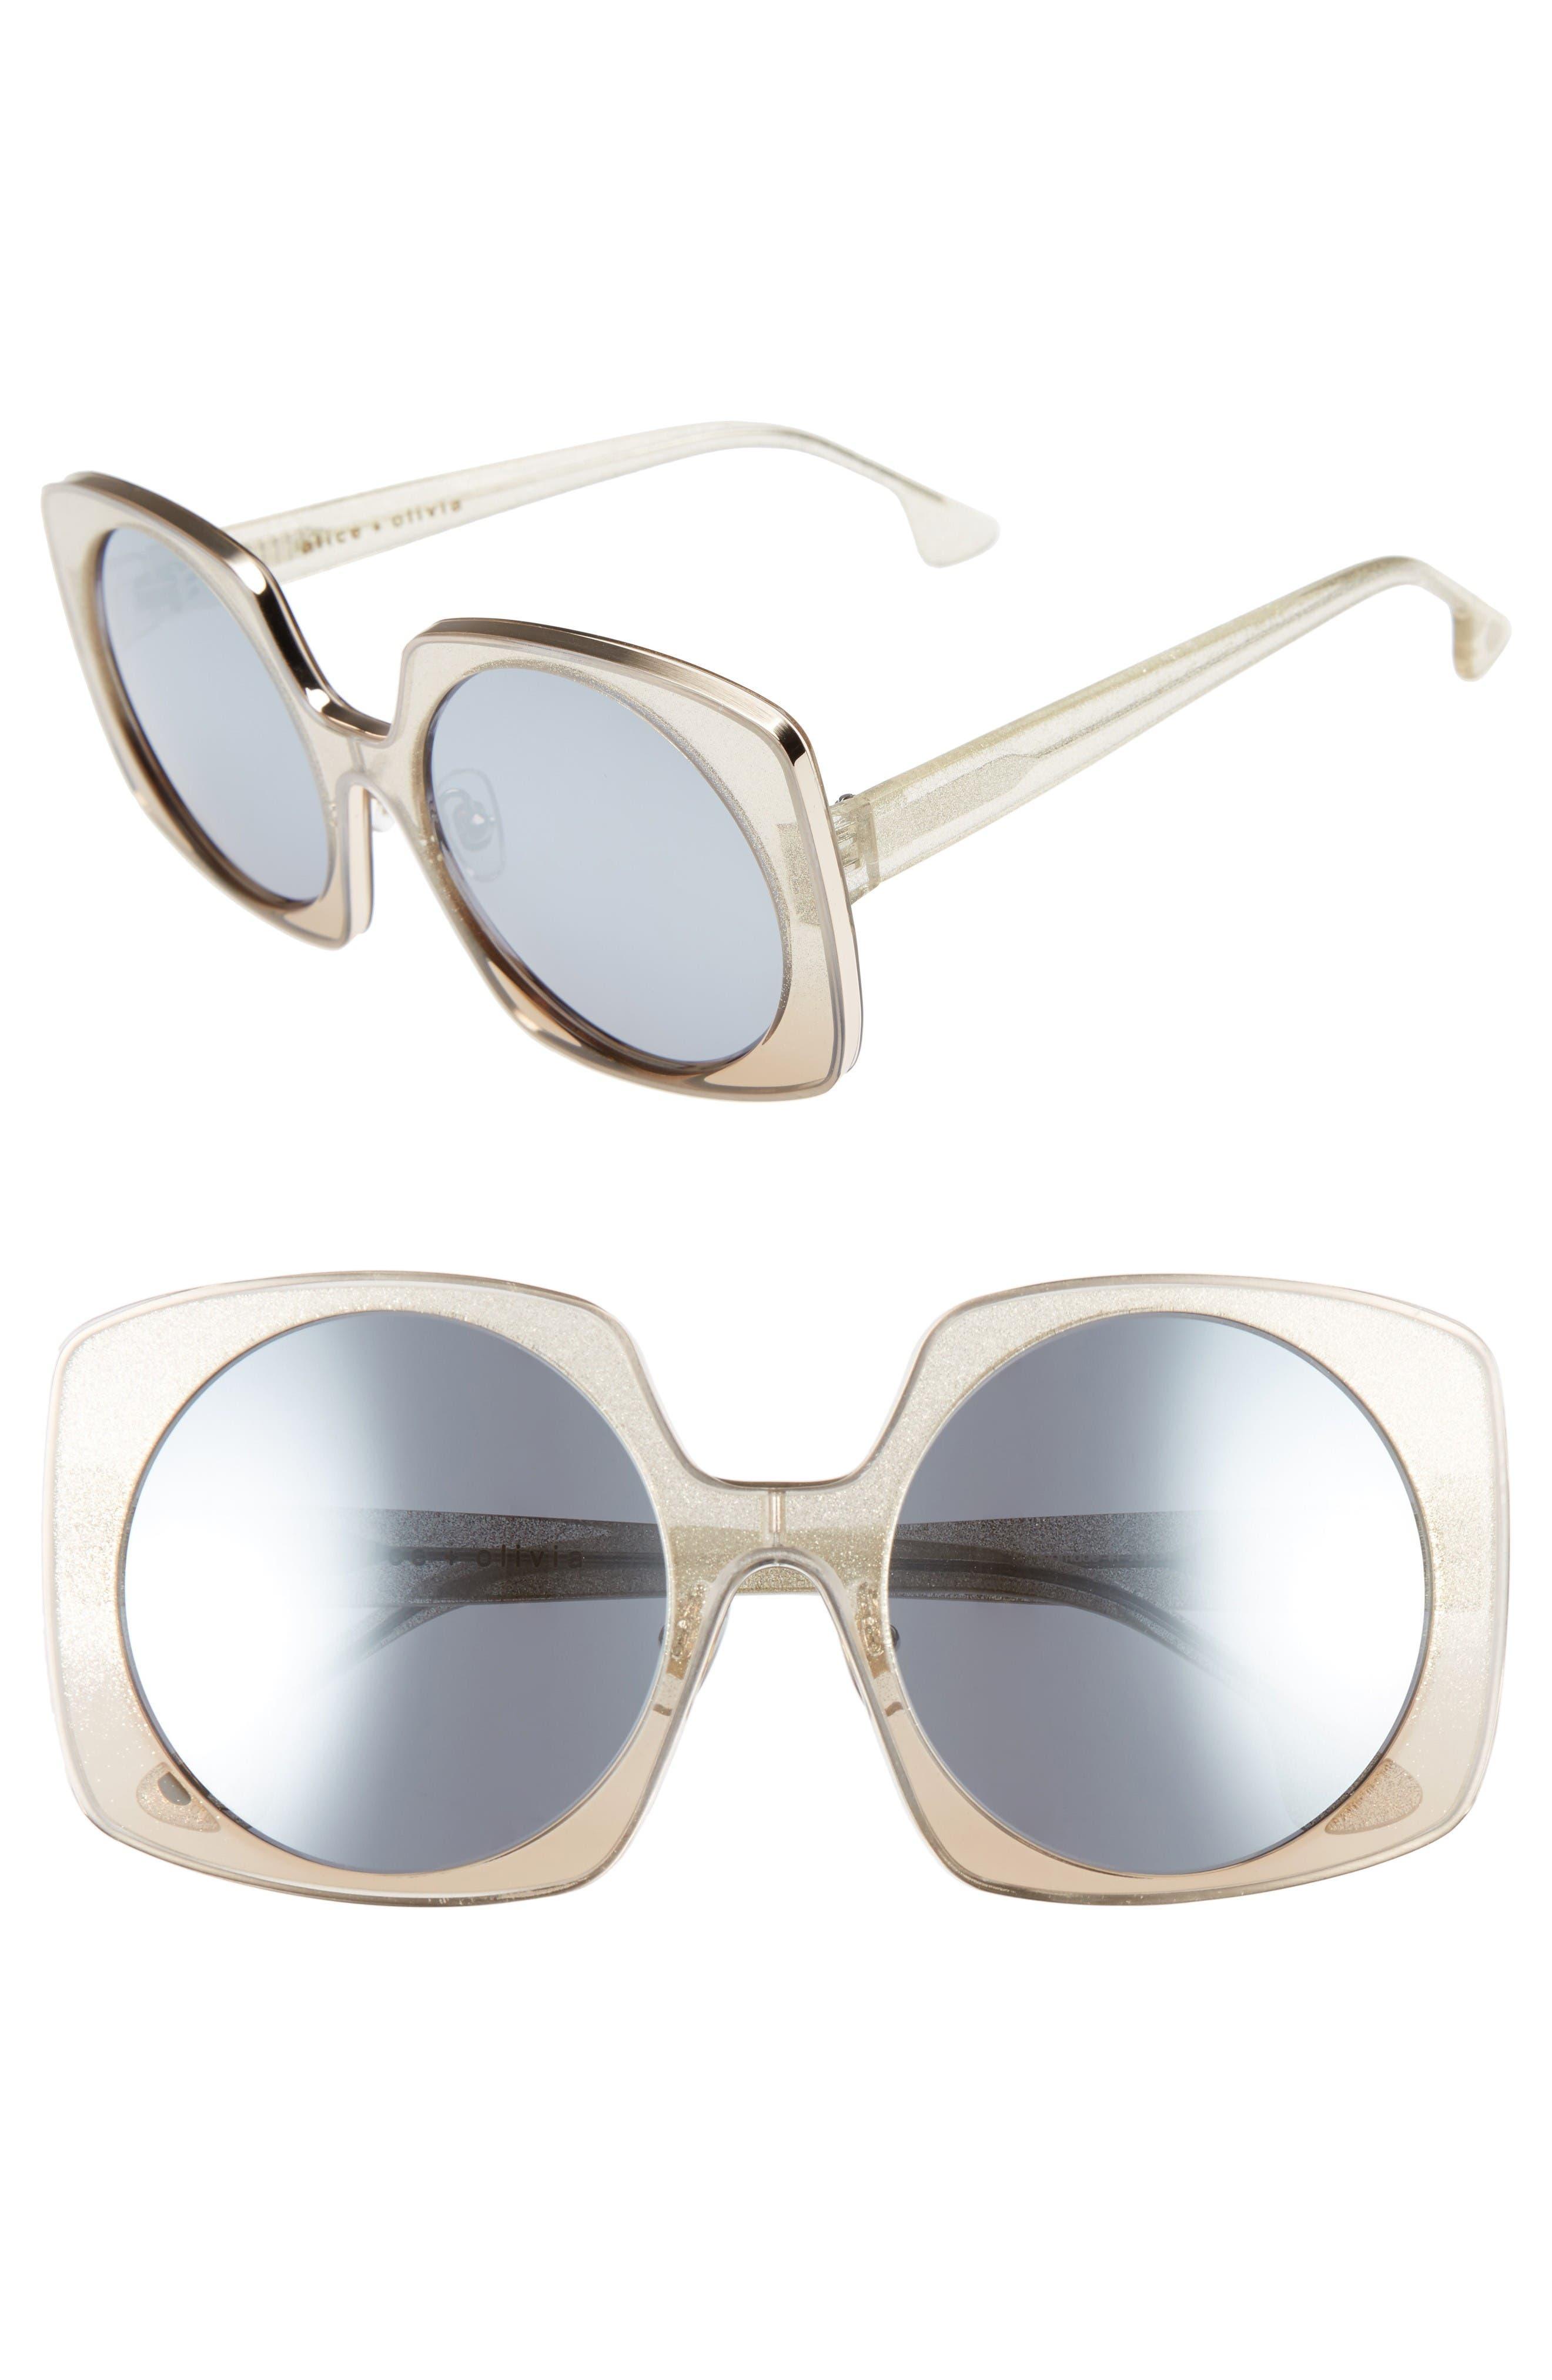 Main Image - Alice + Olivia Canton 55mm Special Fit Square Sunglasses